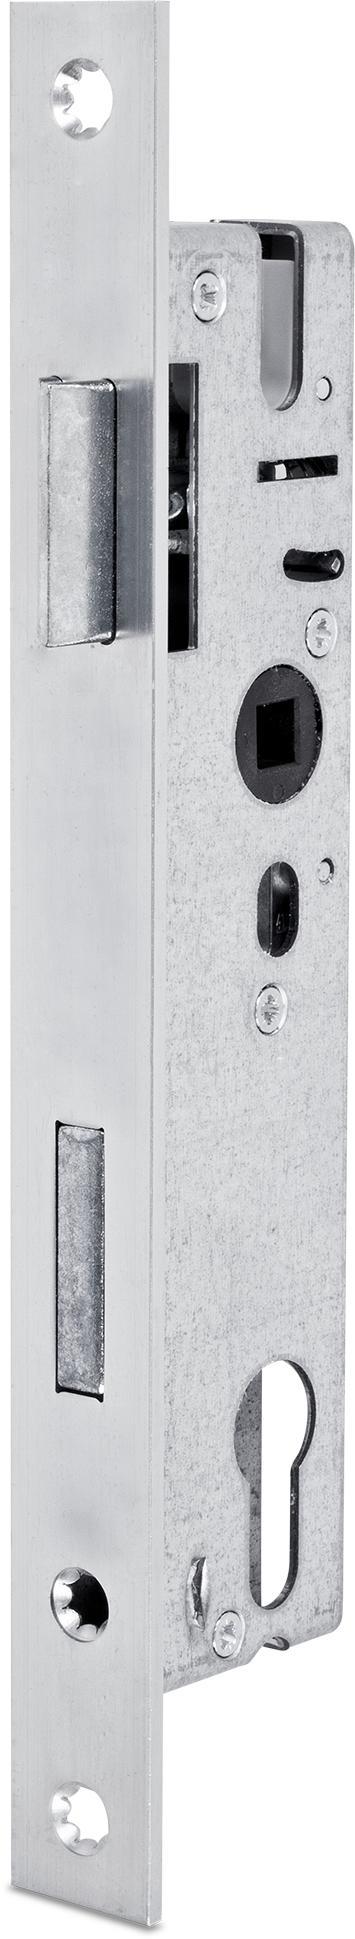 Einsteckschloss mit Wechsel, Dornmaß 18 mm, Entfernung 92 mm, Vierkantnuss 8 mm, Falle und Riegel bündig, DIN rechts / links verwendbar